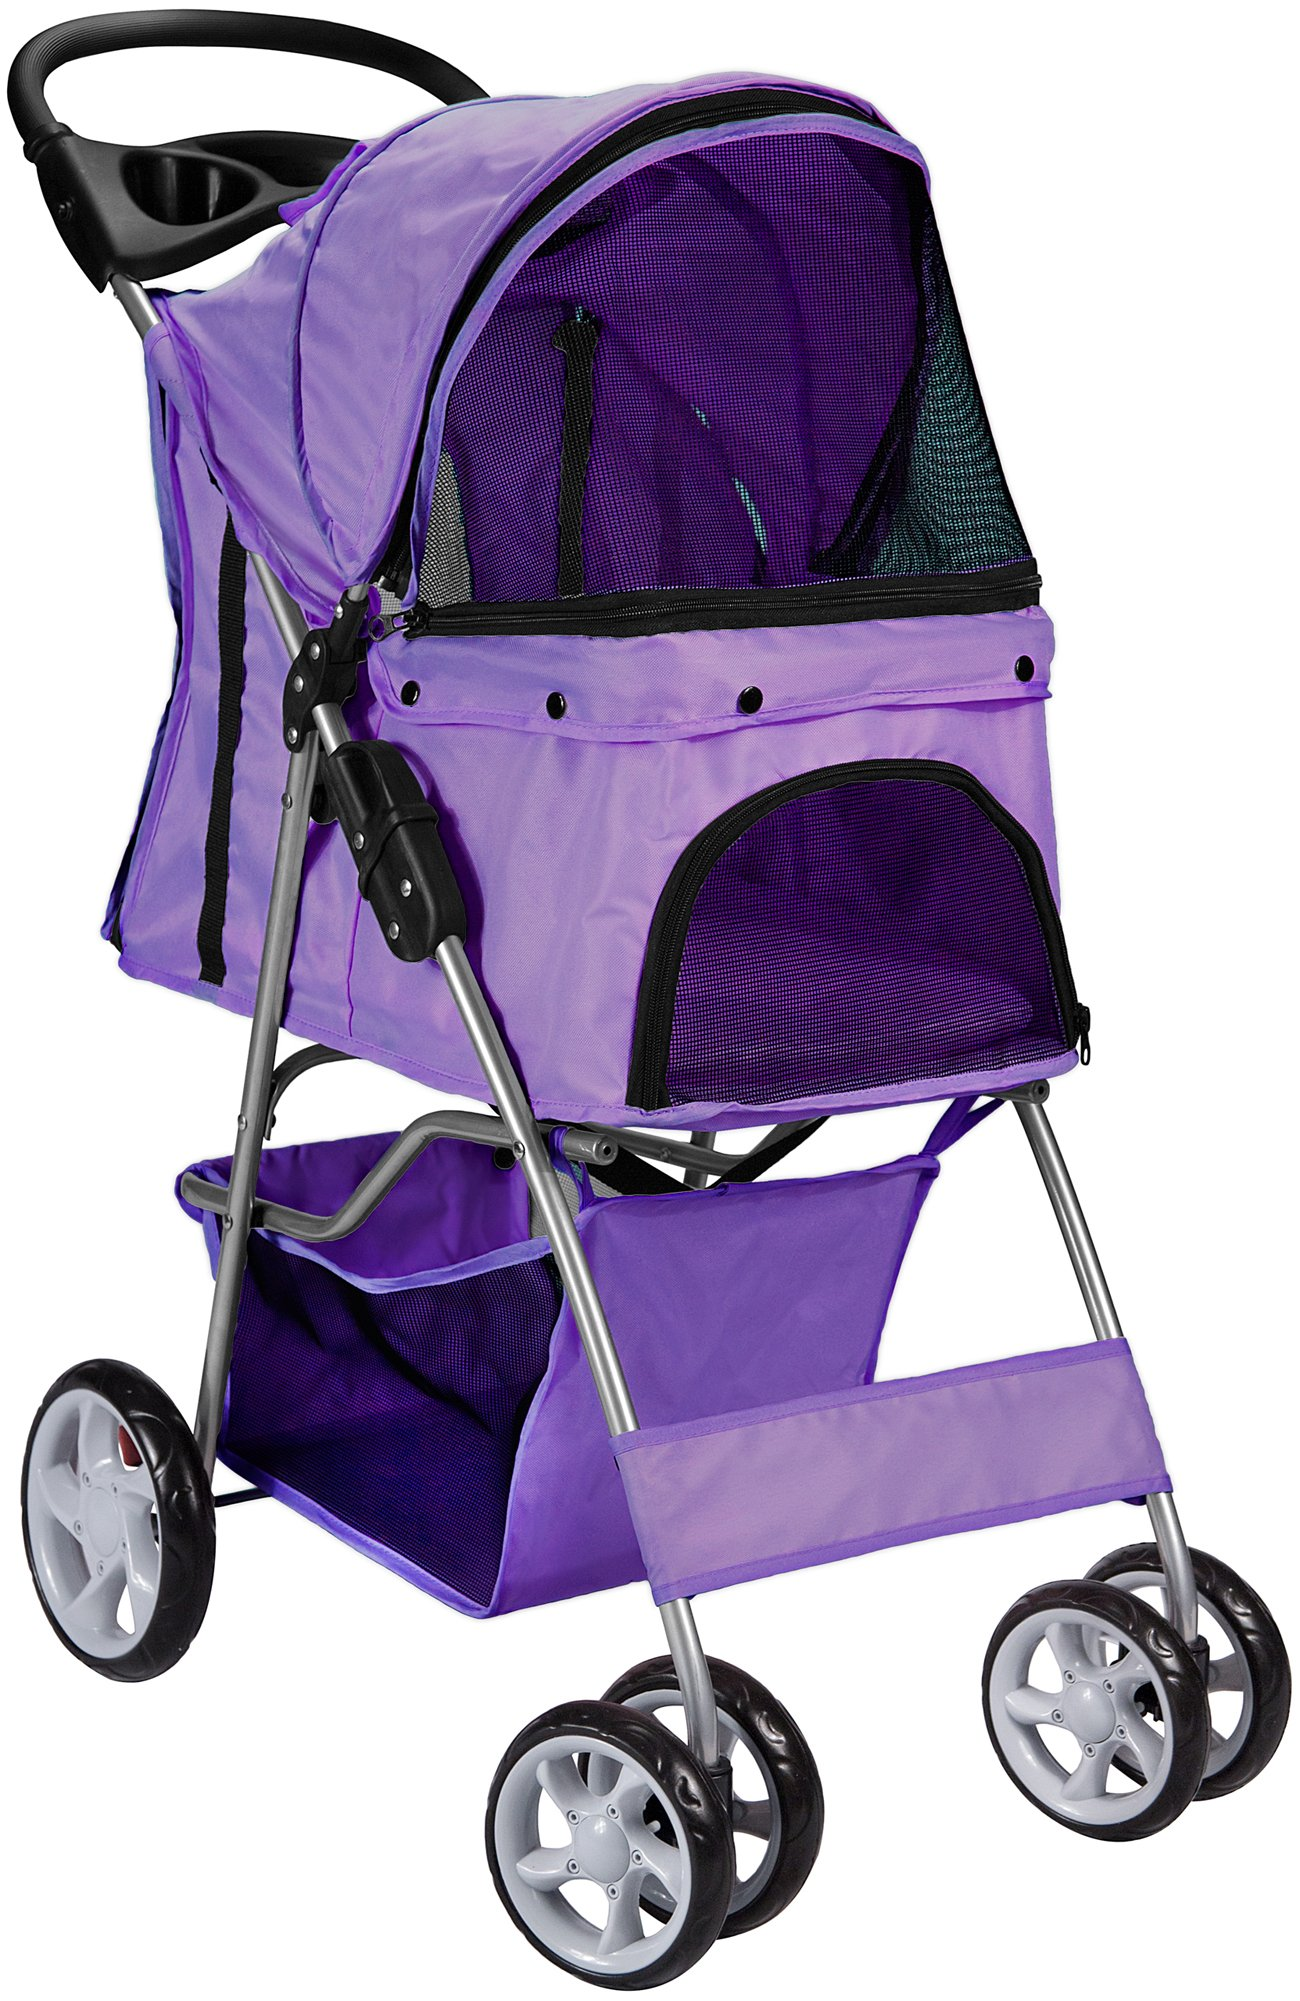 OxGord Pet Stroller Cat/Dog Easy Walk Folding Travel Carrier Carriage, Lavender Purple